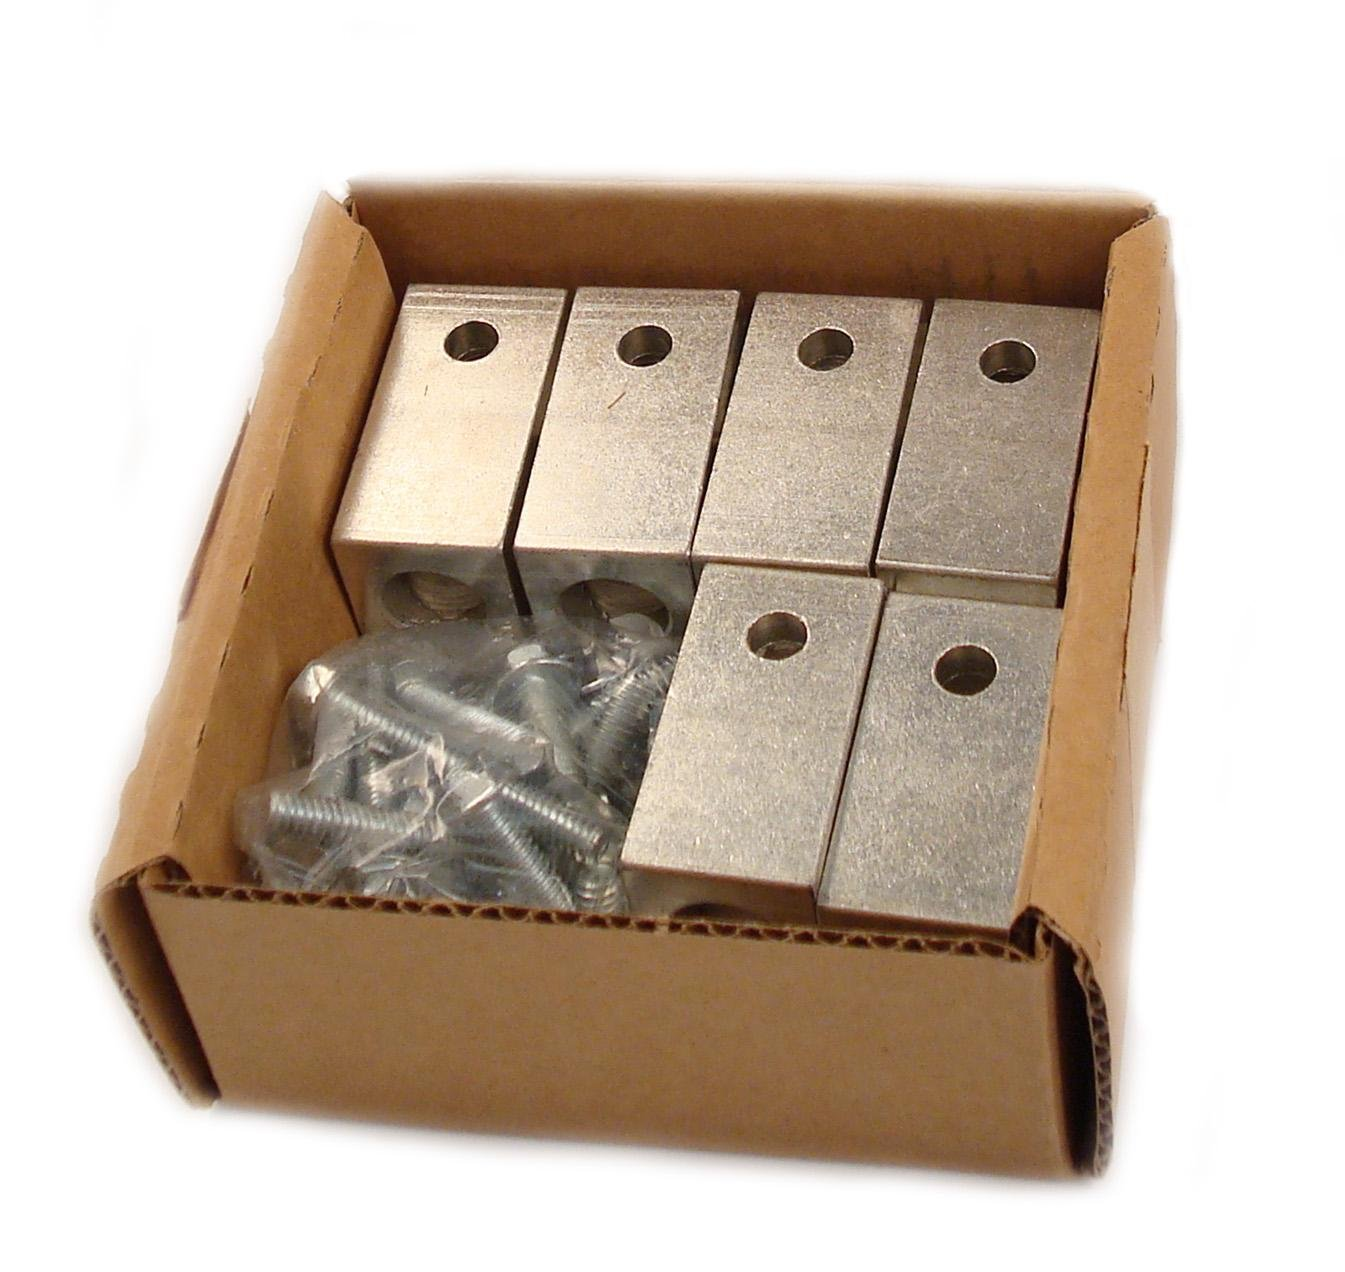 Eaton LKS2 Terminal Lug Kit, 12 x 6-250 MCM Lugs & Hardware by Eaton